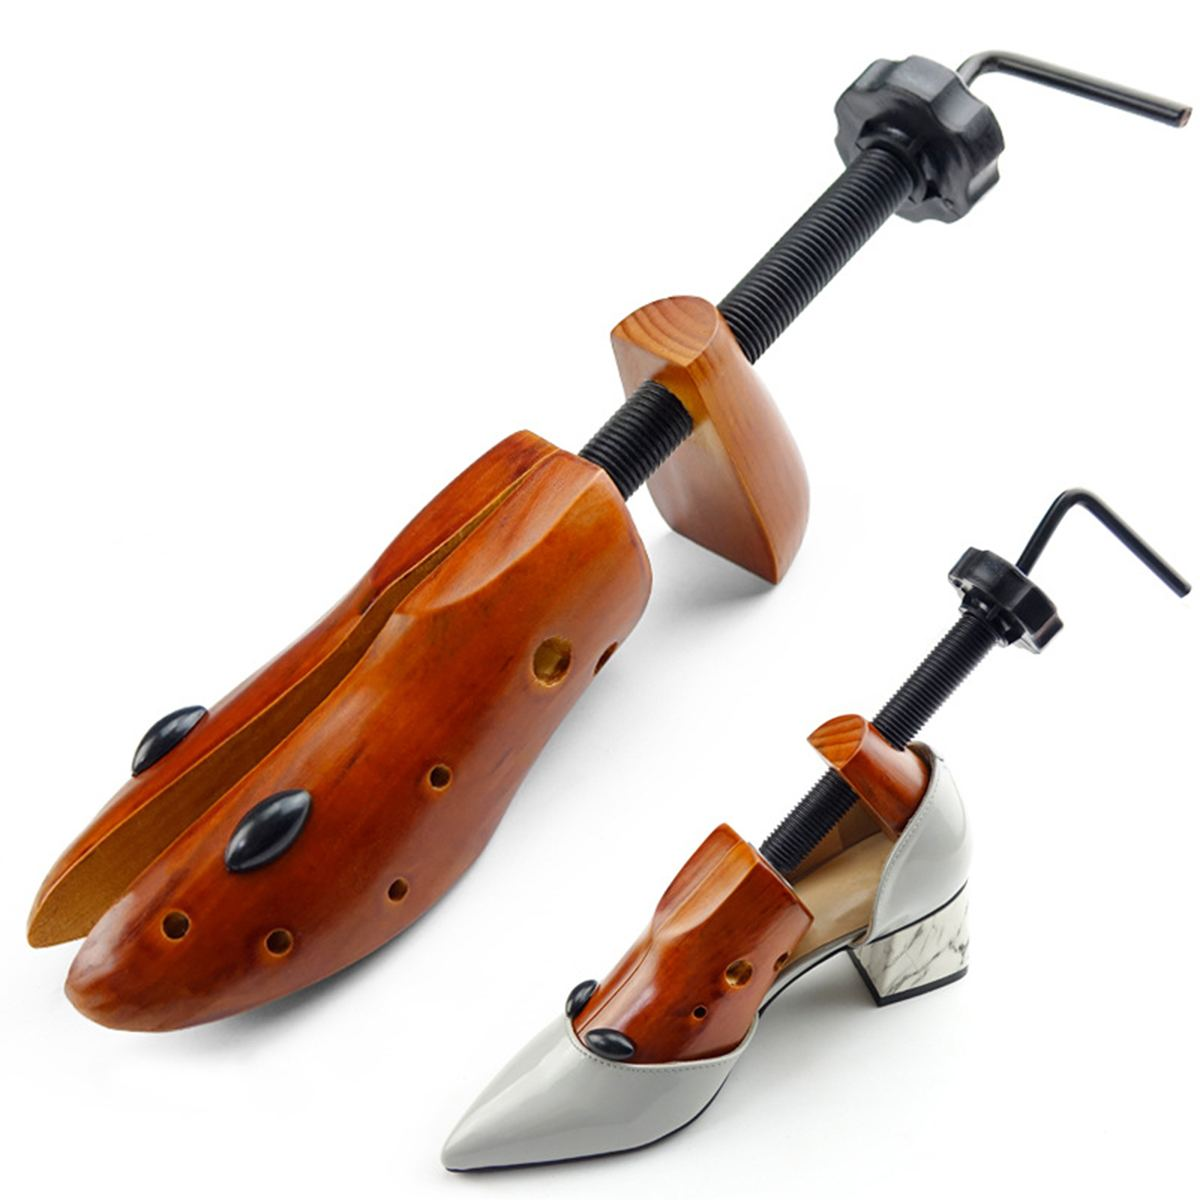 1pcs 2-Way Wooden Shoe Tree For Men And Women Shoes Expander Djustable Shoe Stretcher Shaper Rack Sawol